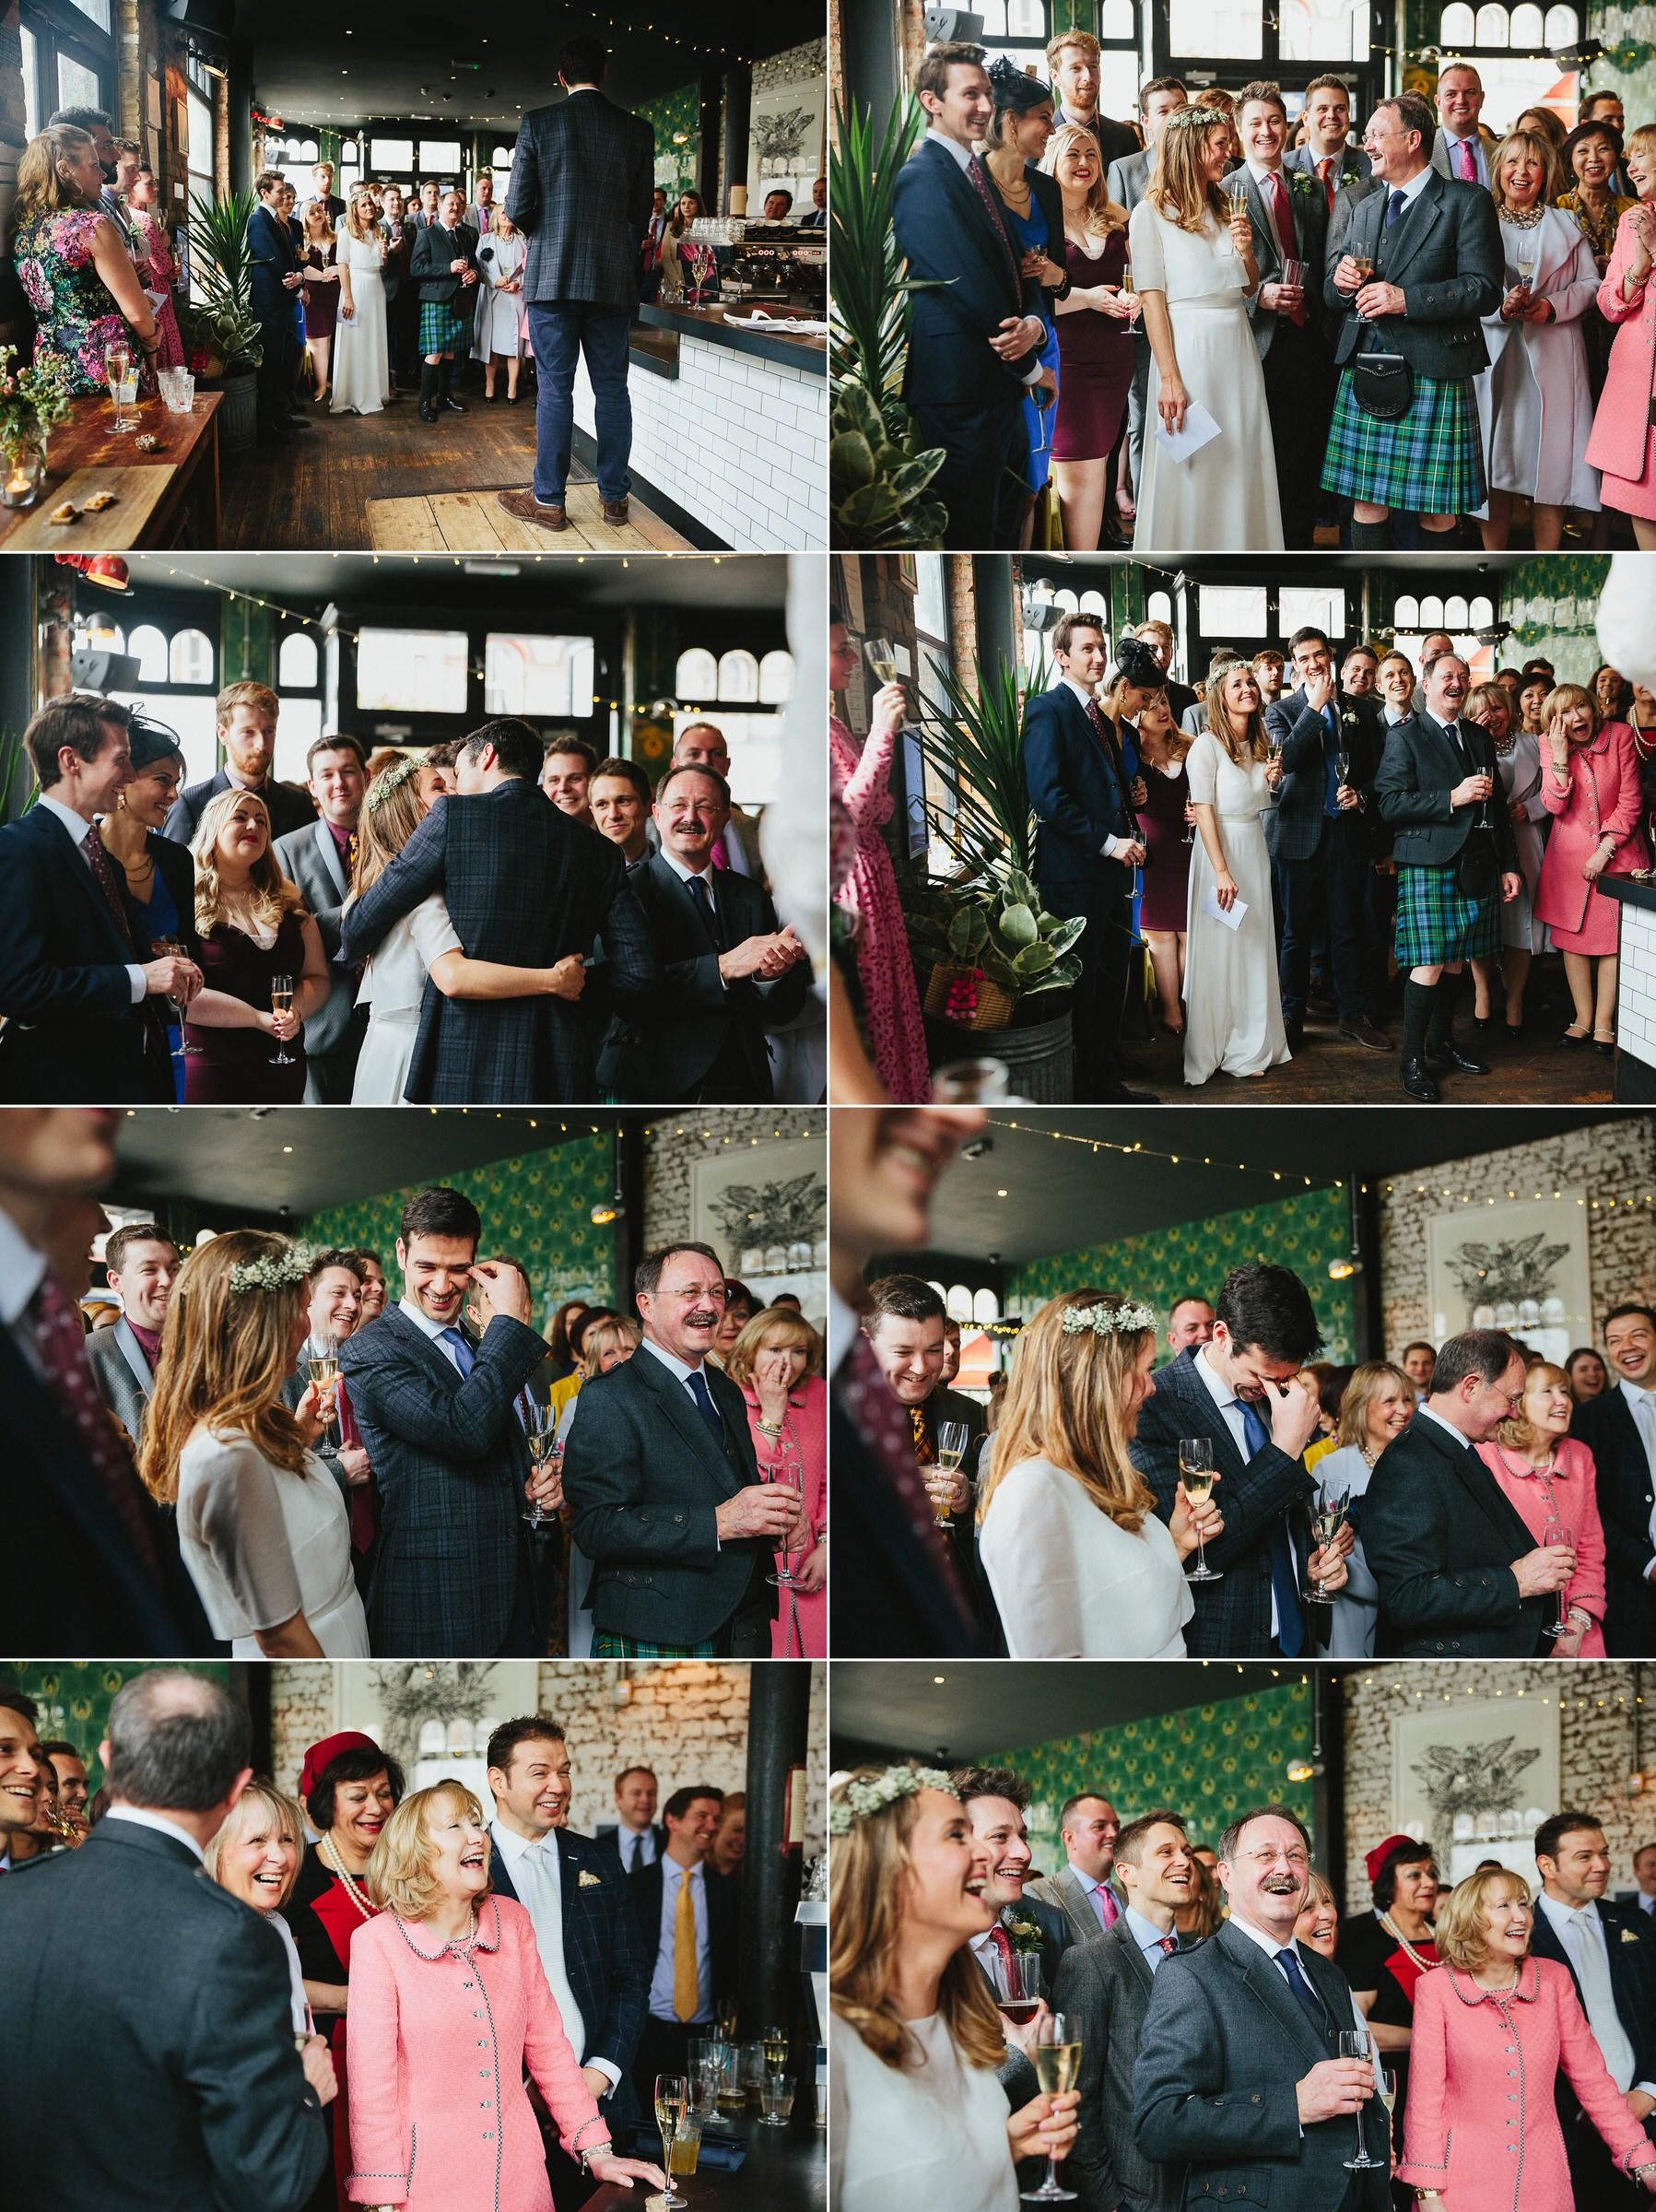 The Elgin pub wedding